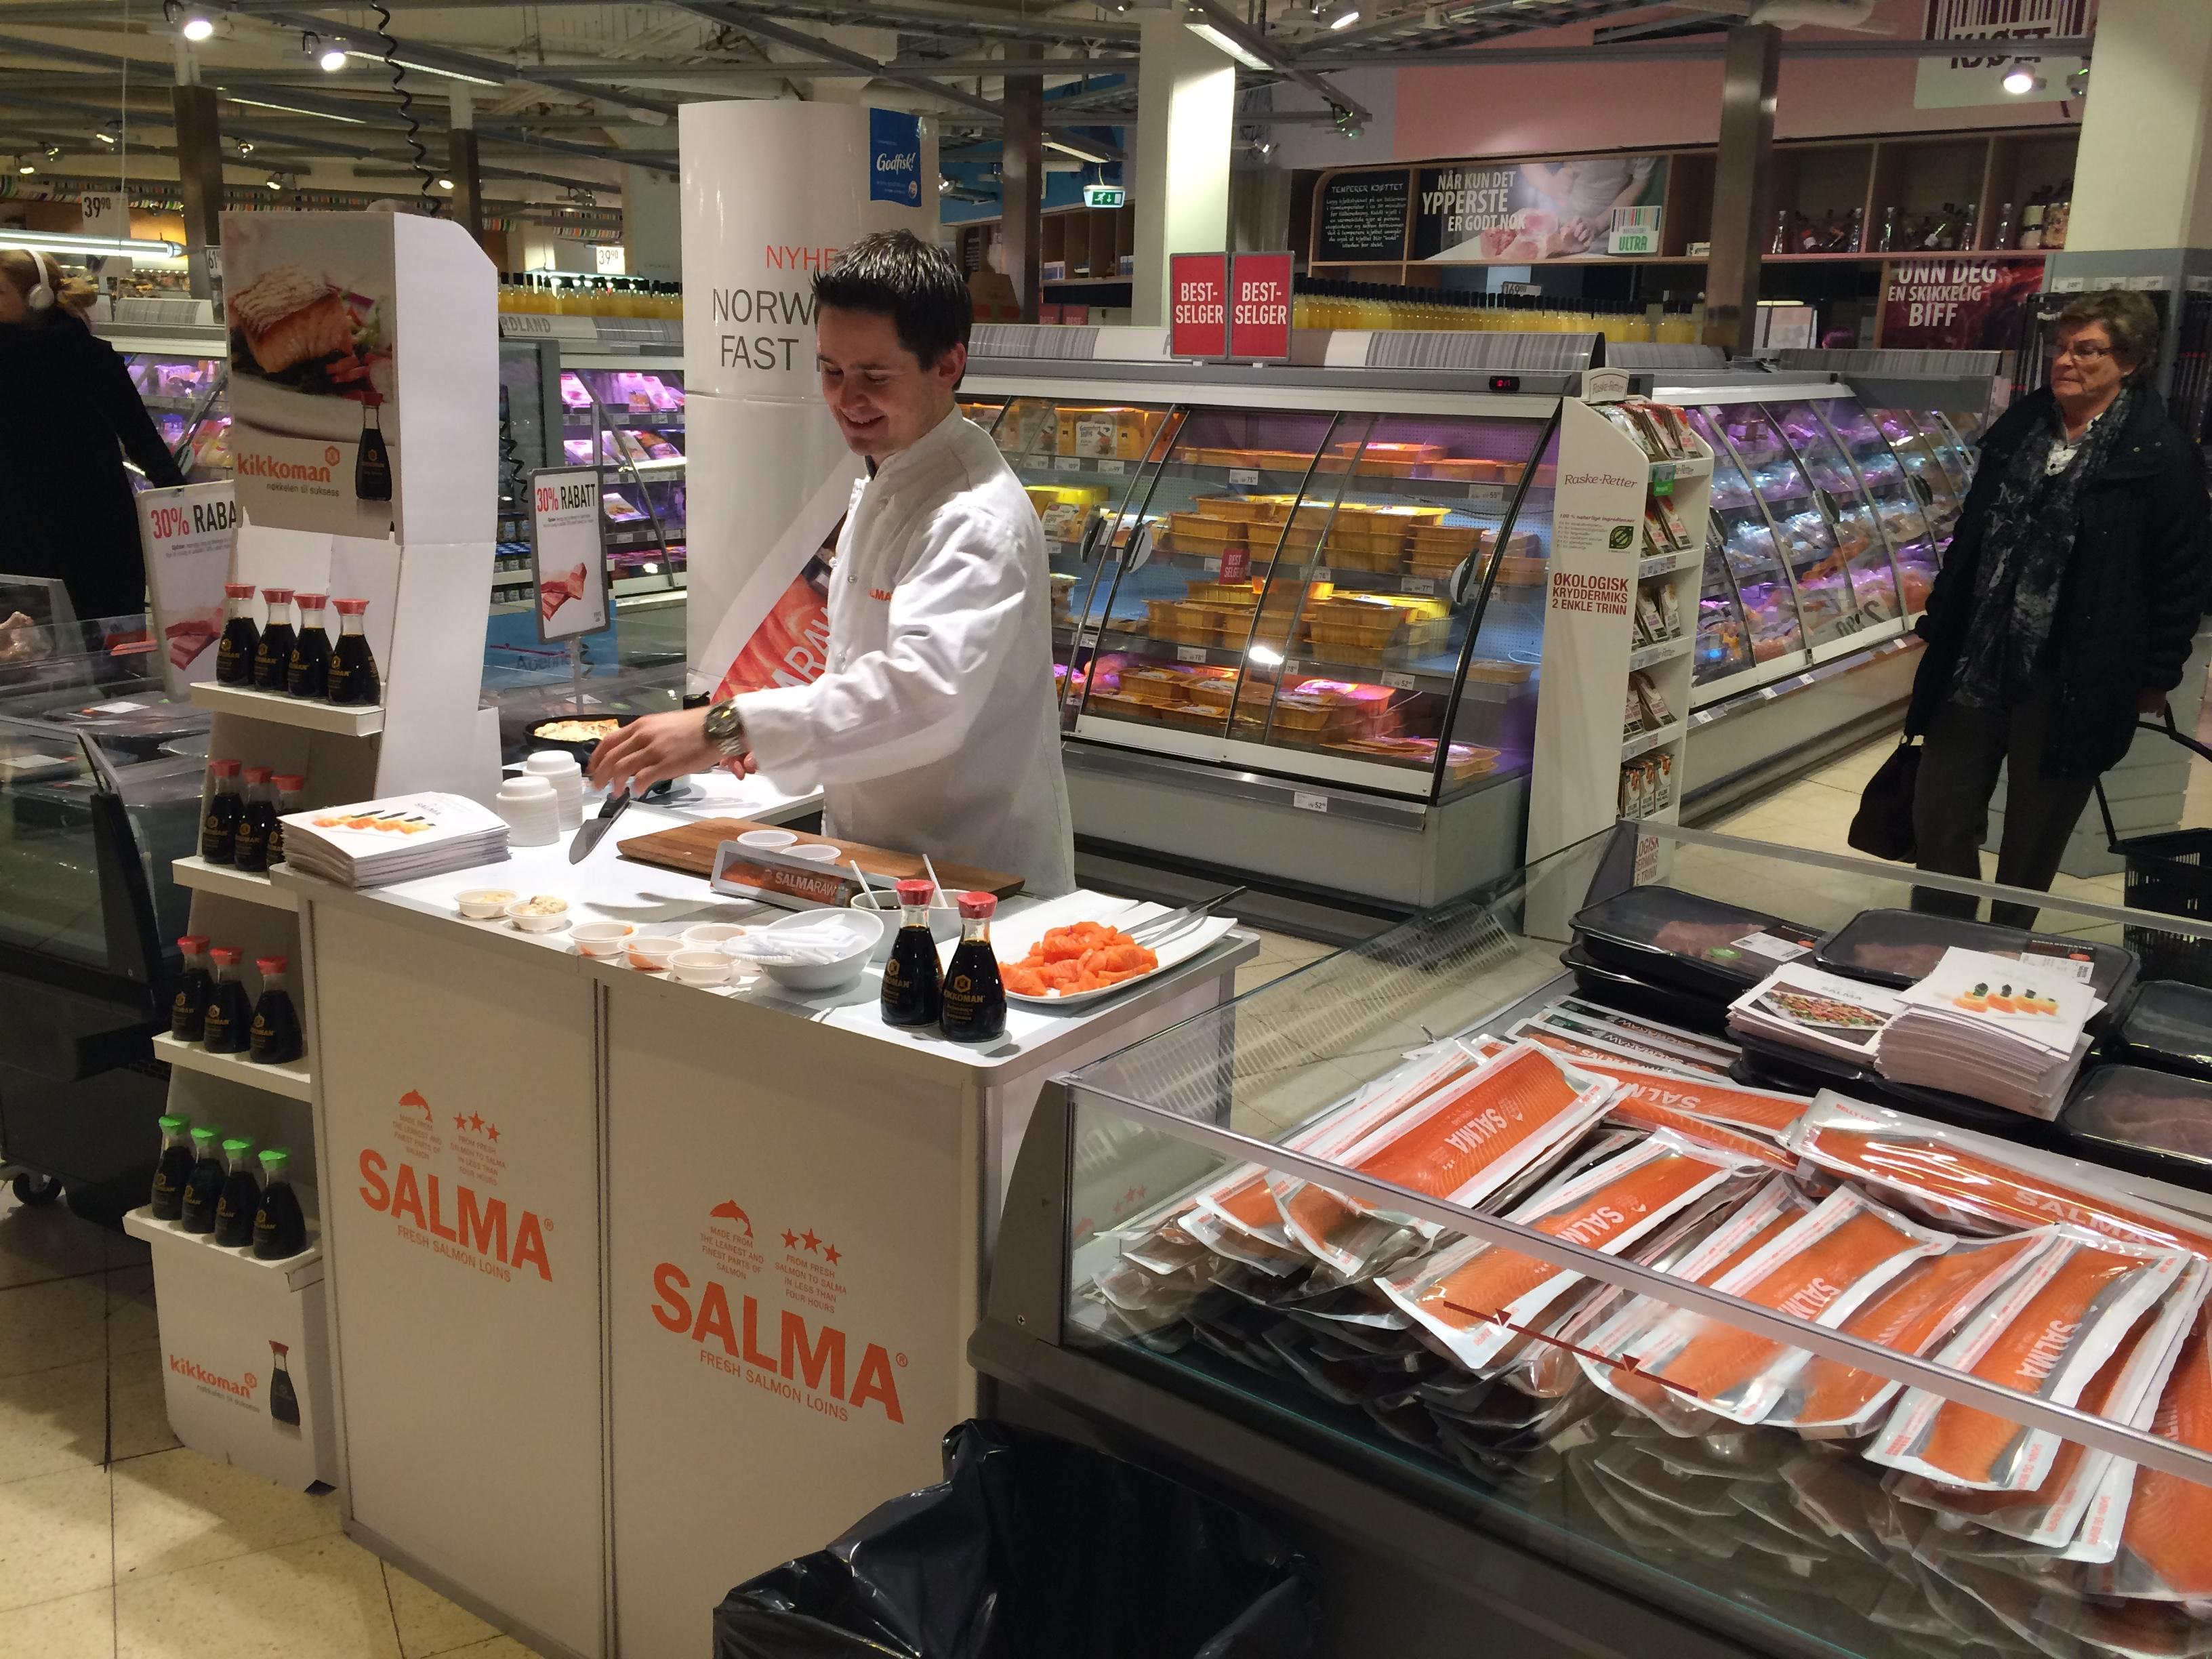 Salma Ultra Sandvika 14.02 (2)